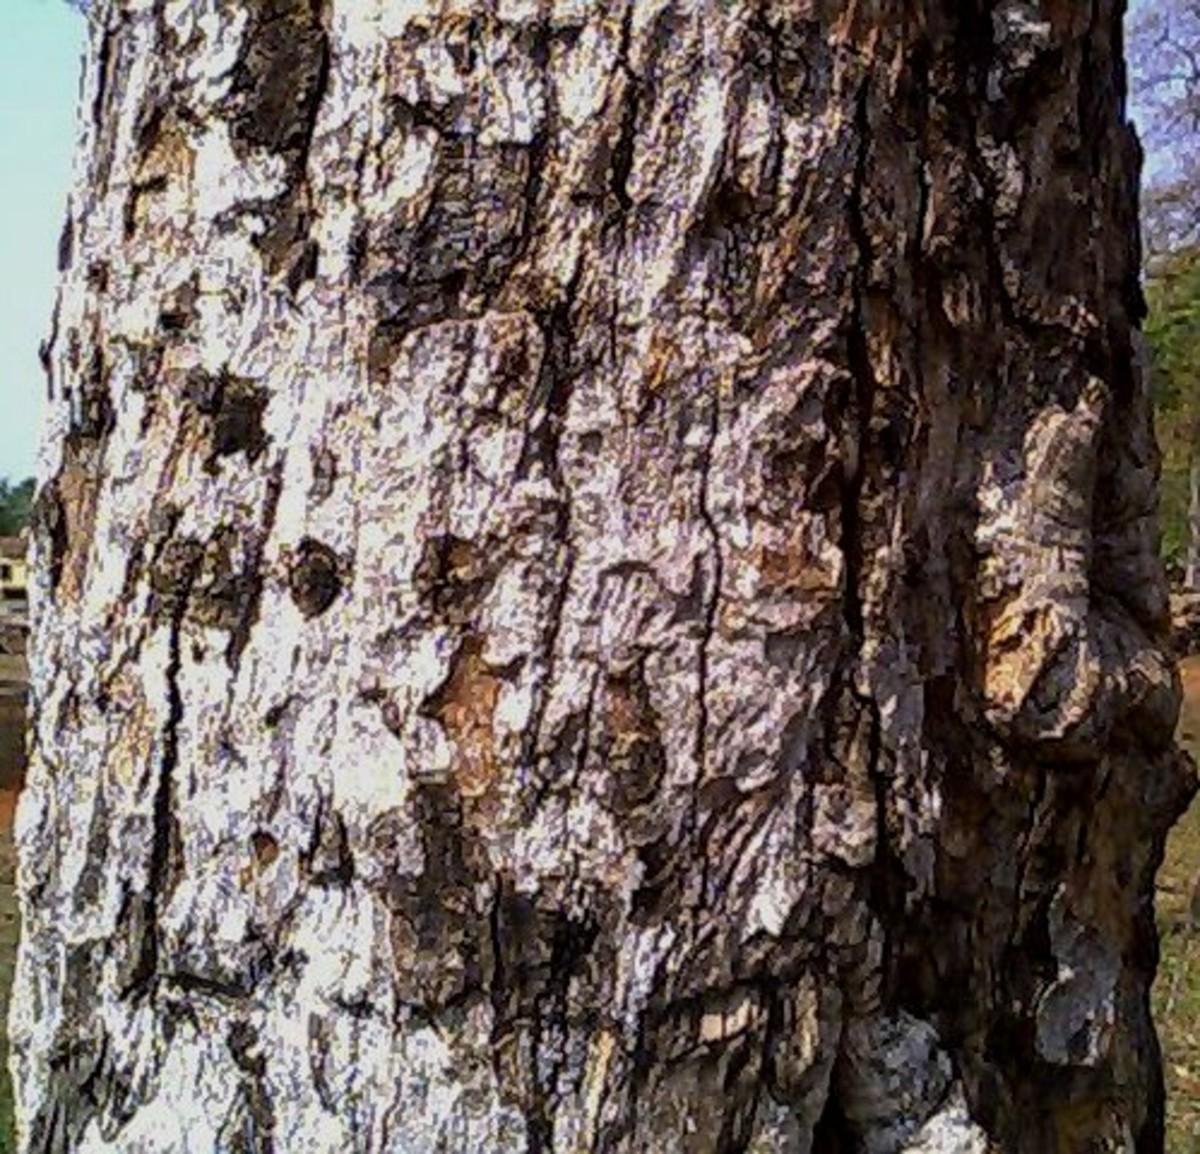 Bark of the bael tree